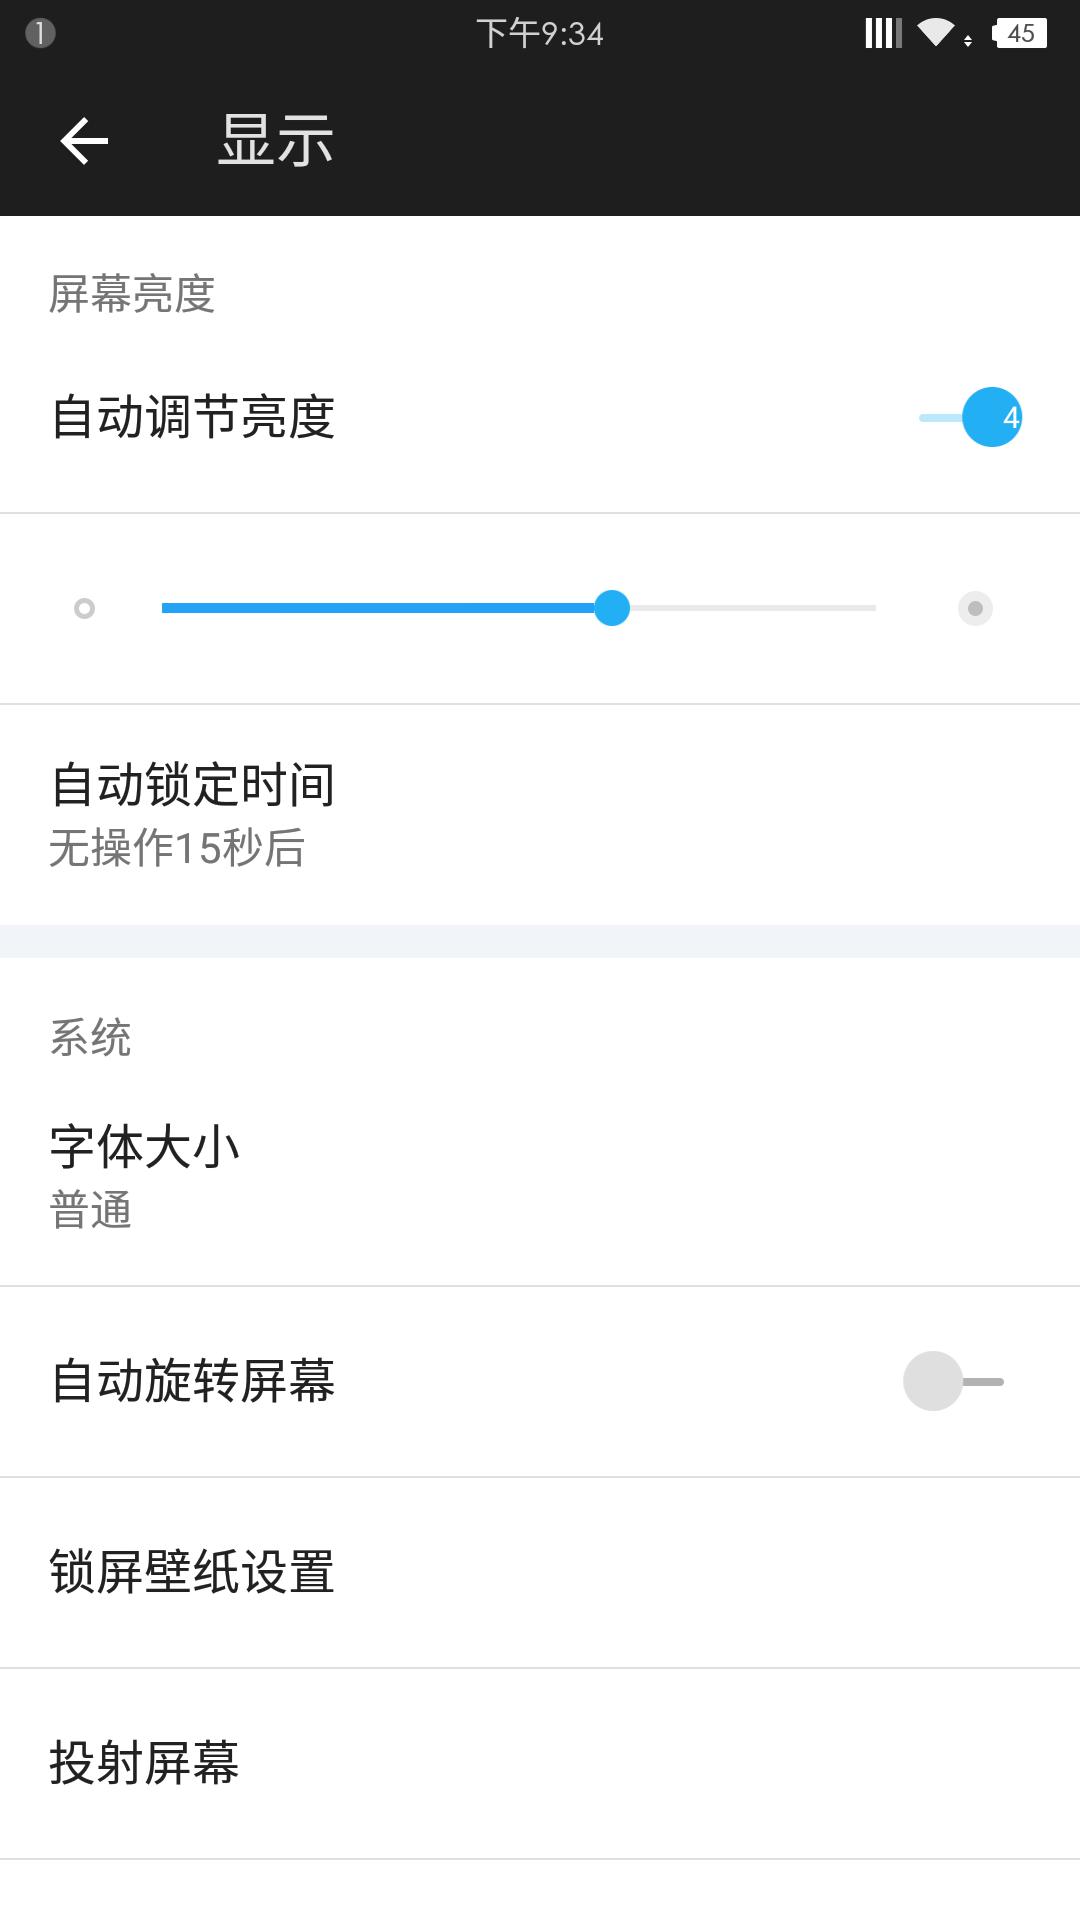 Screenshot_2015-08-31-21-34-51.png